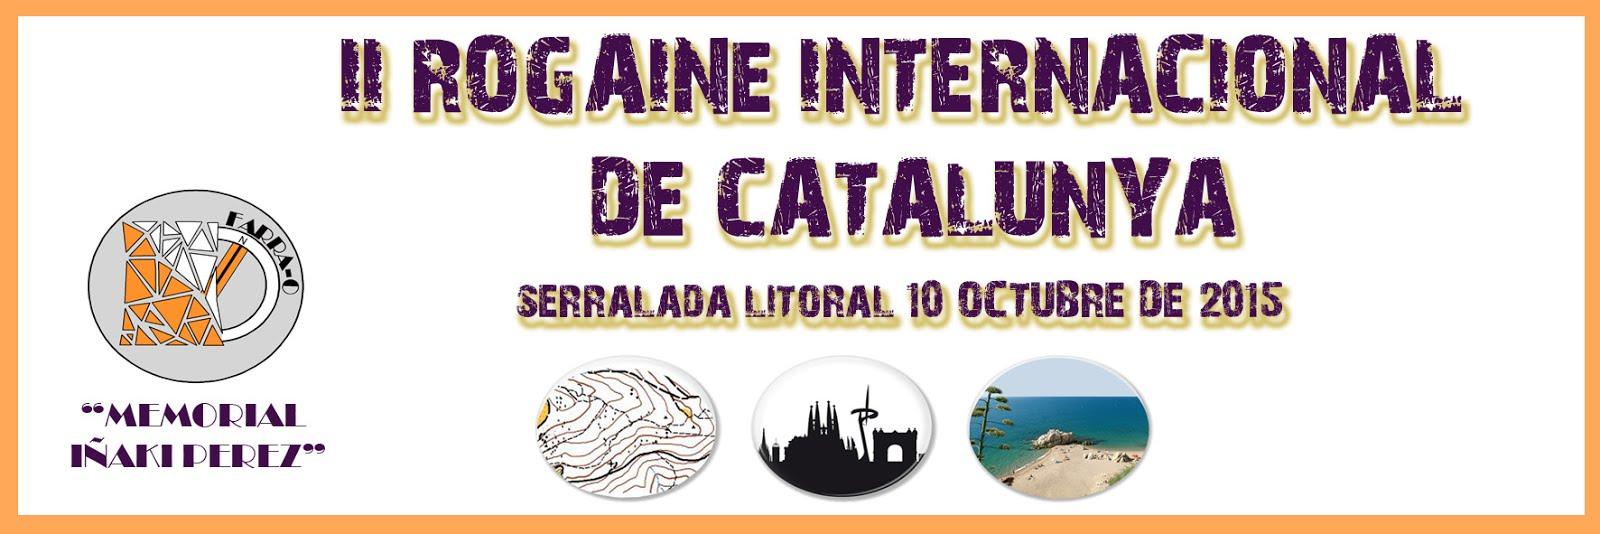 "10/10/2015 - II ROGAINE INTERNACIONAL 12h DE CATALUNYA ""Memorial Iñaki Pérez"""